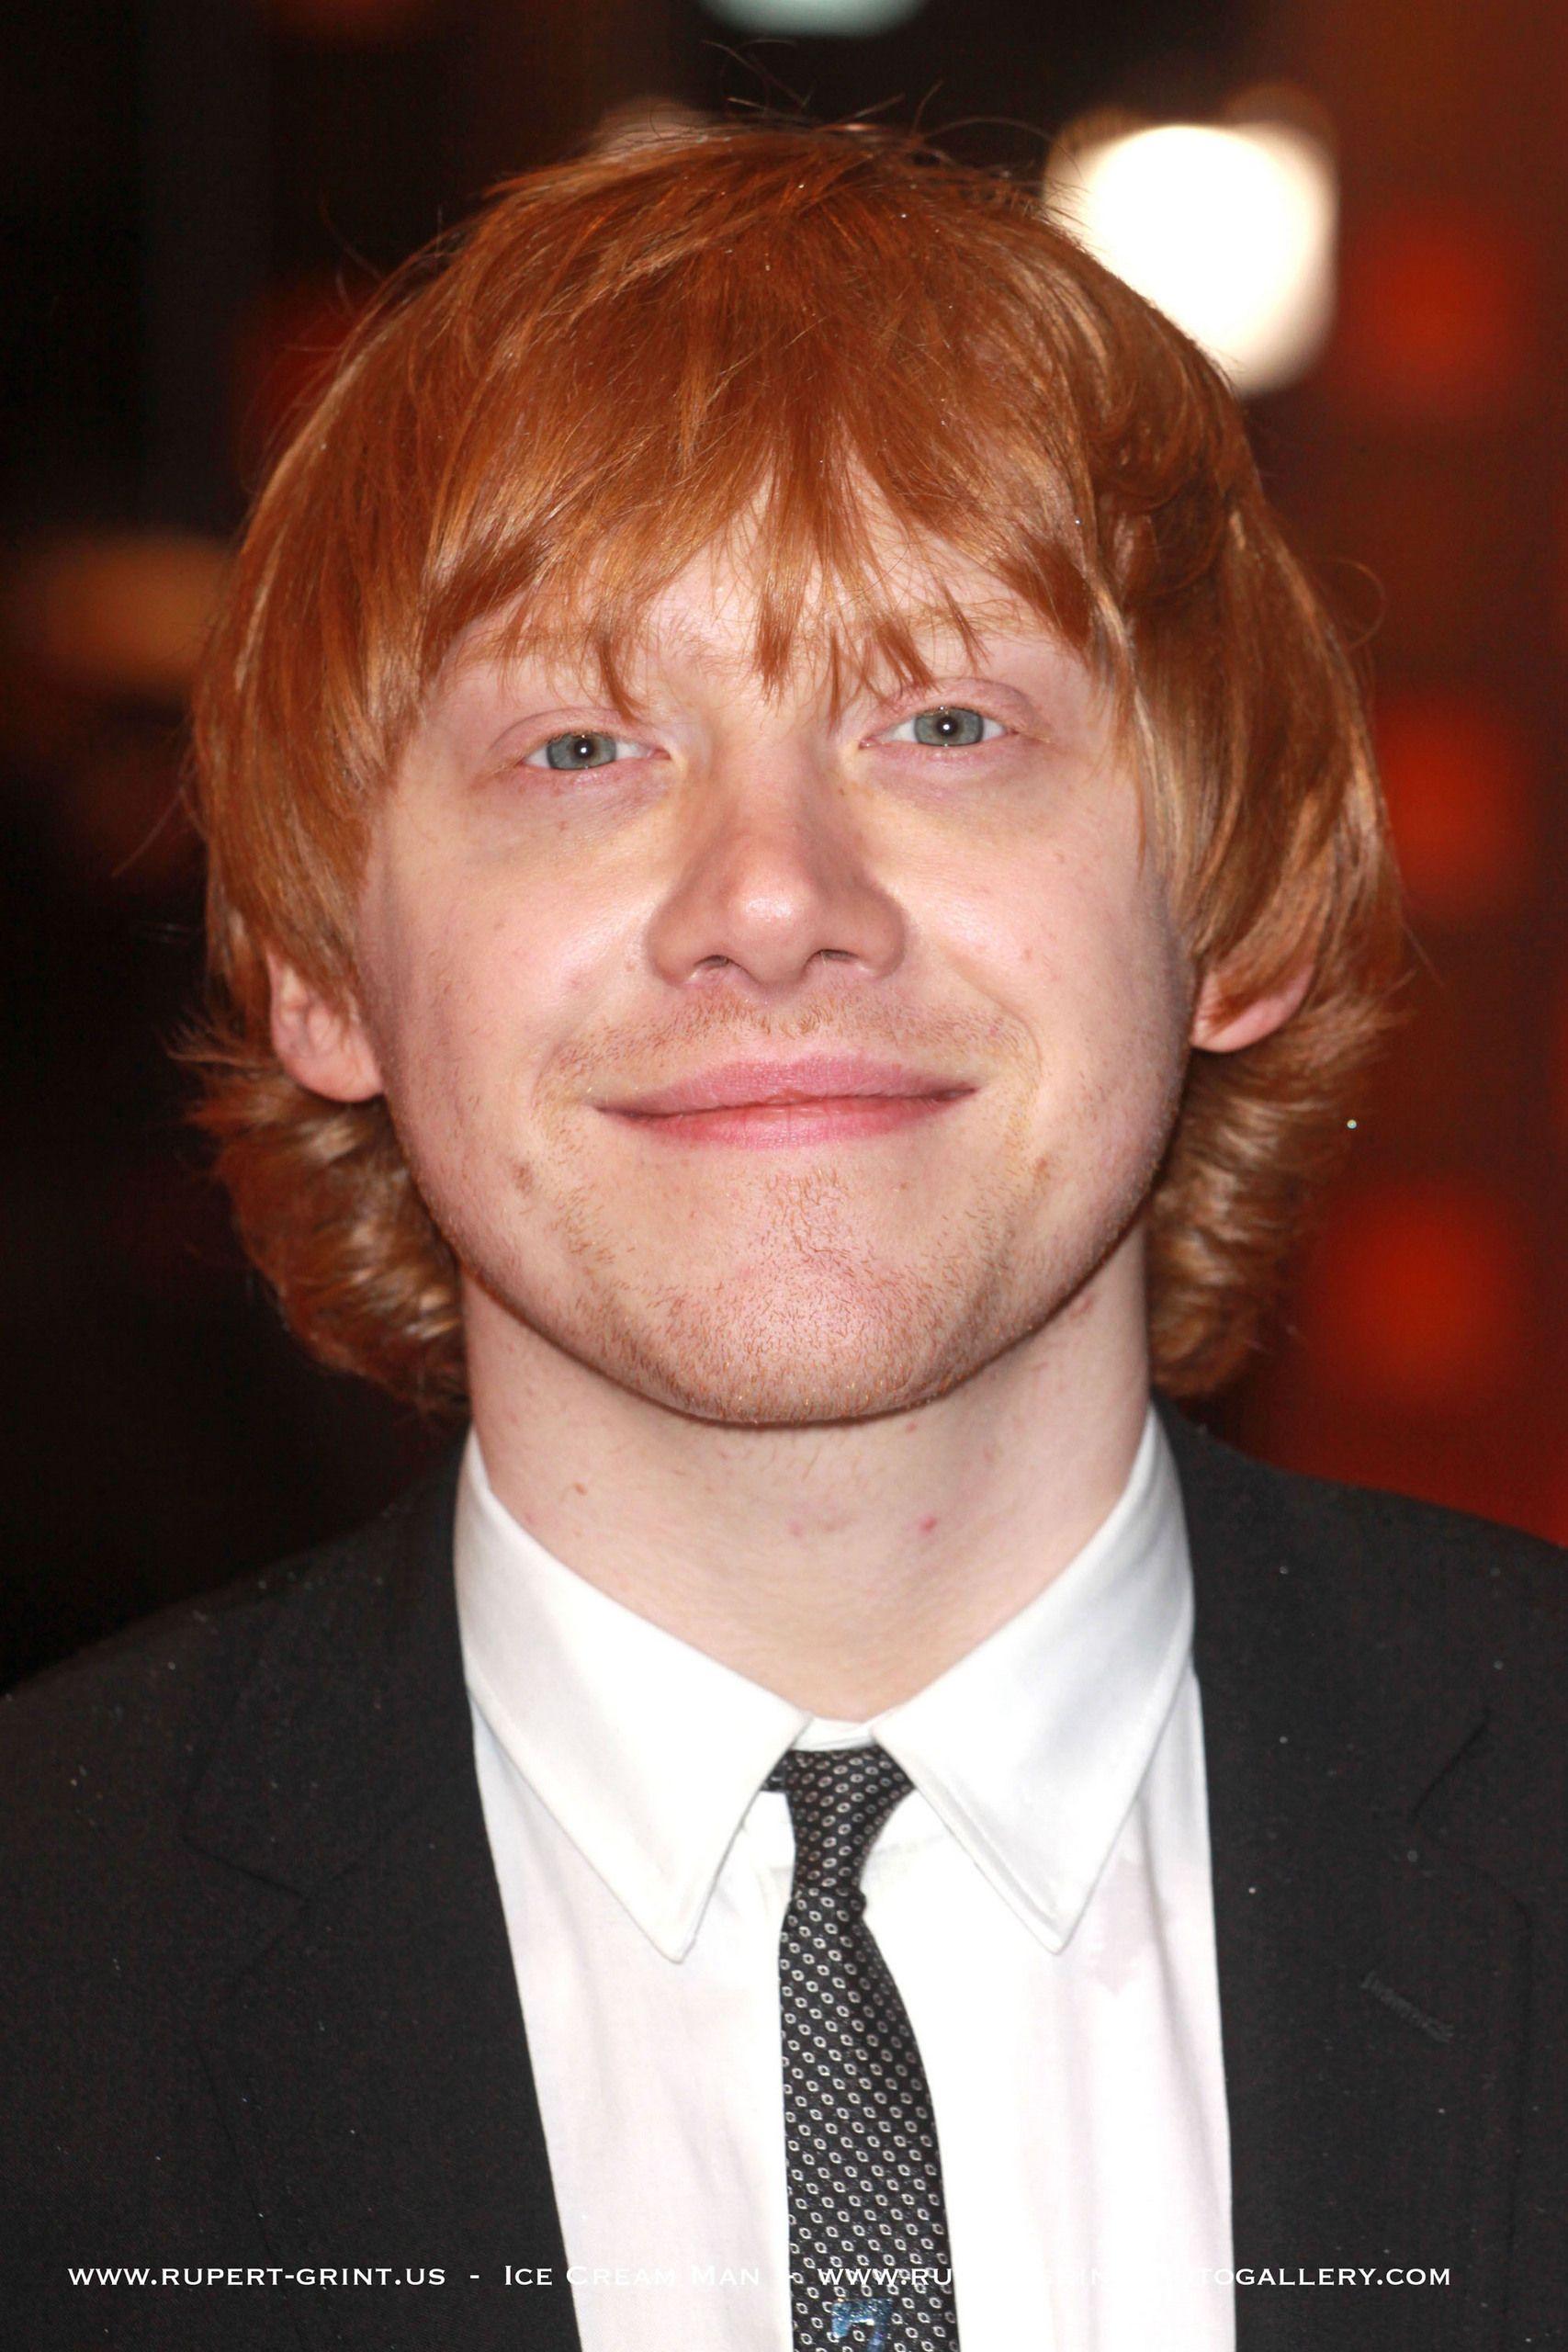 Rupert grints virginity